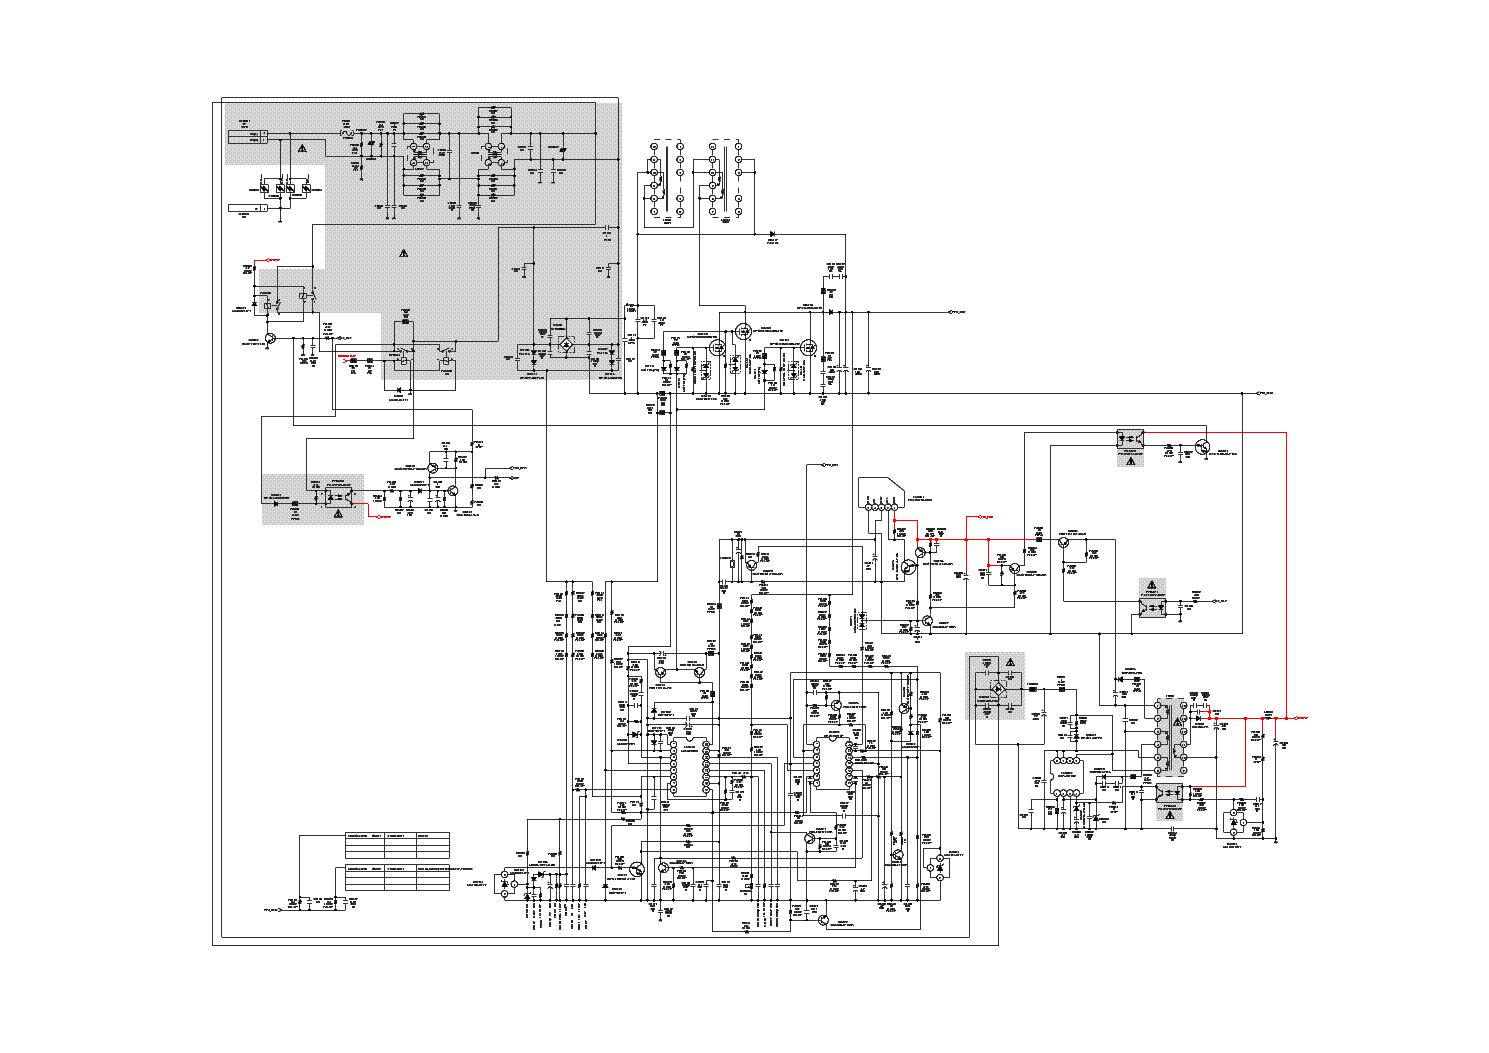 how to power on sony bravia 60r550a manually